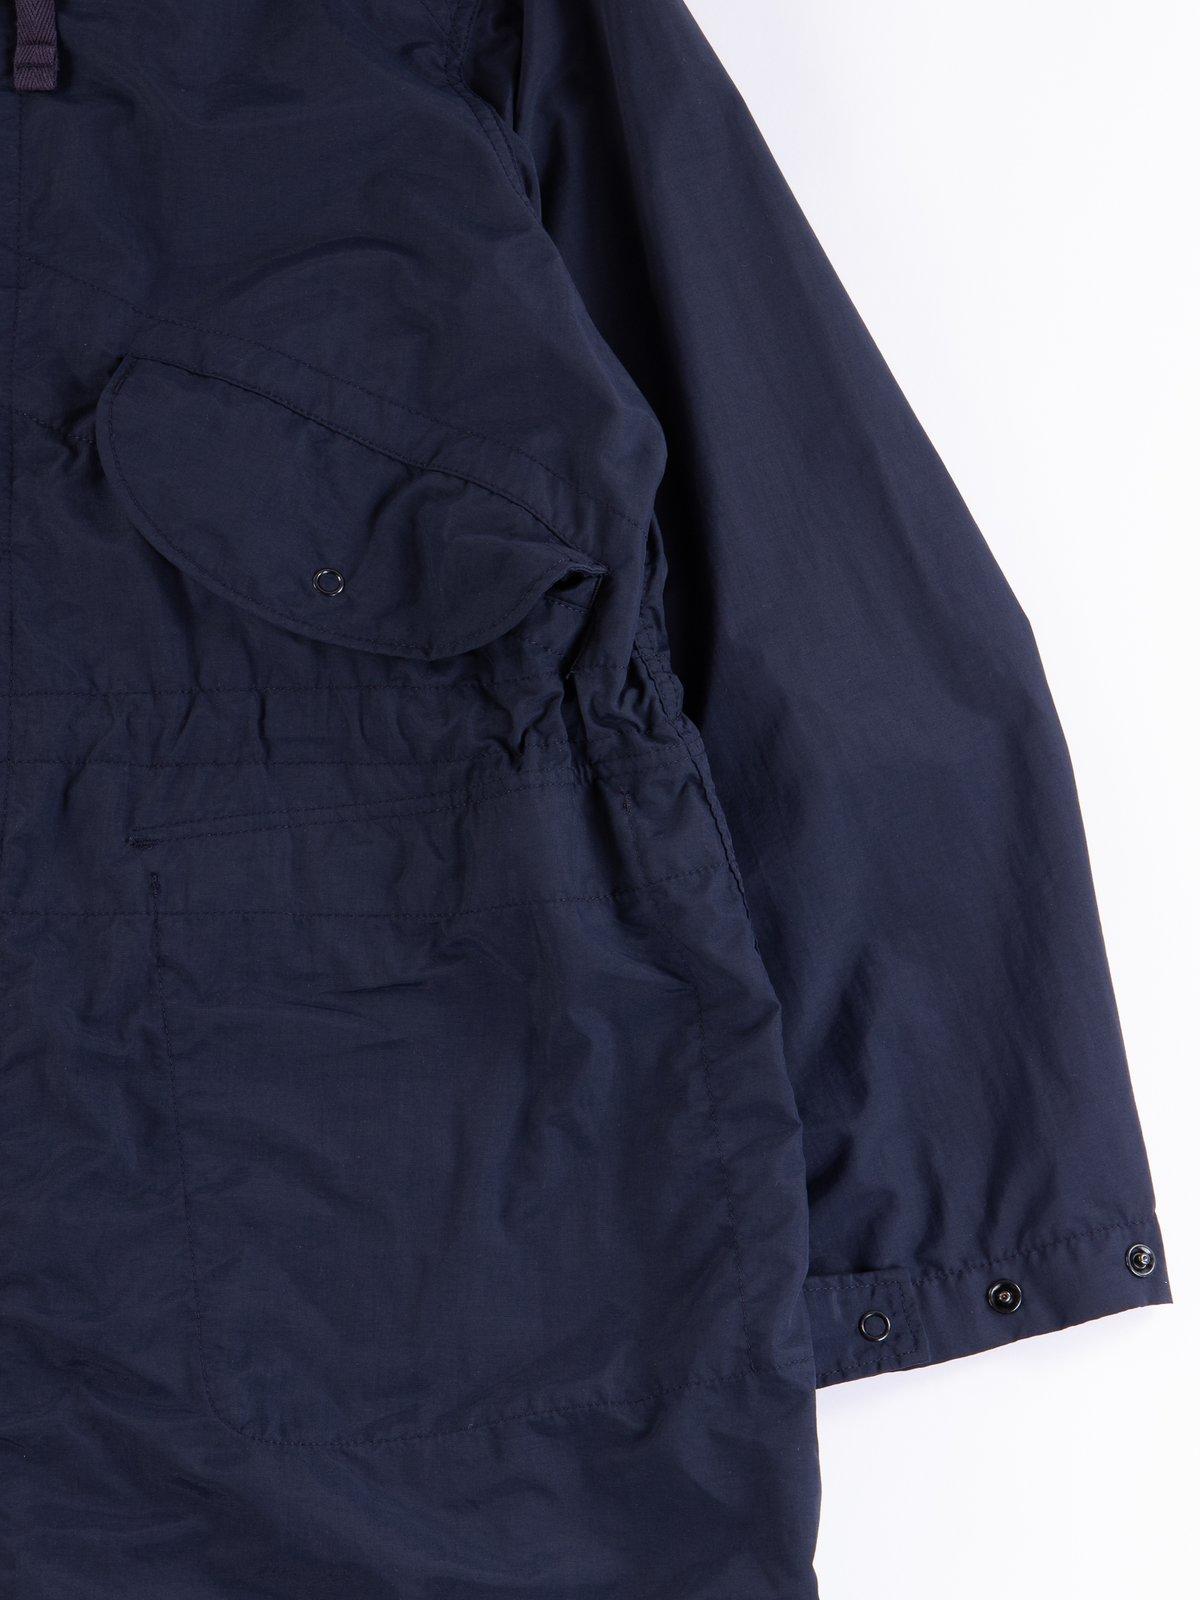 Navy Acrylic Coated Nylon Taffeta Highland Parka - Image 4